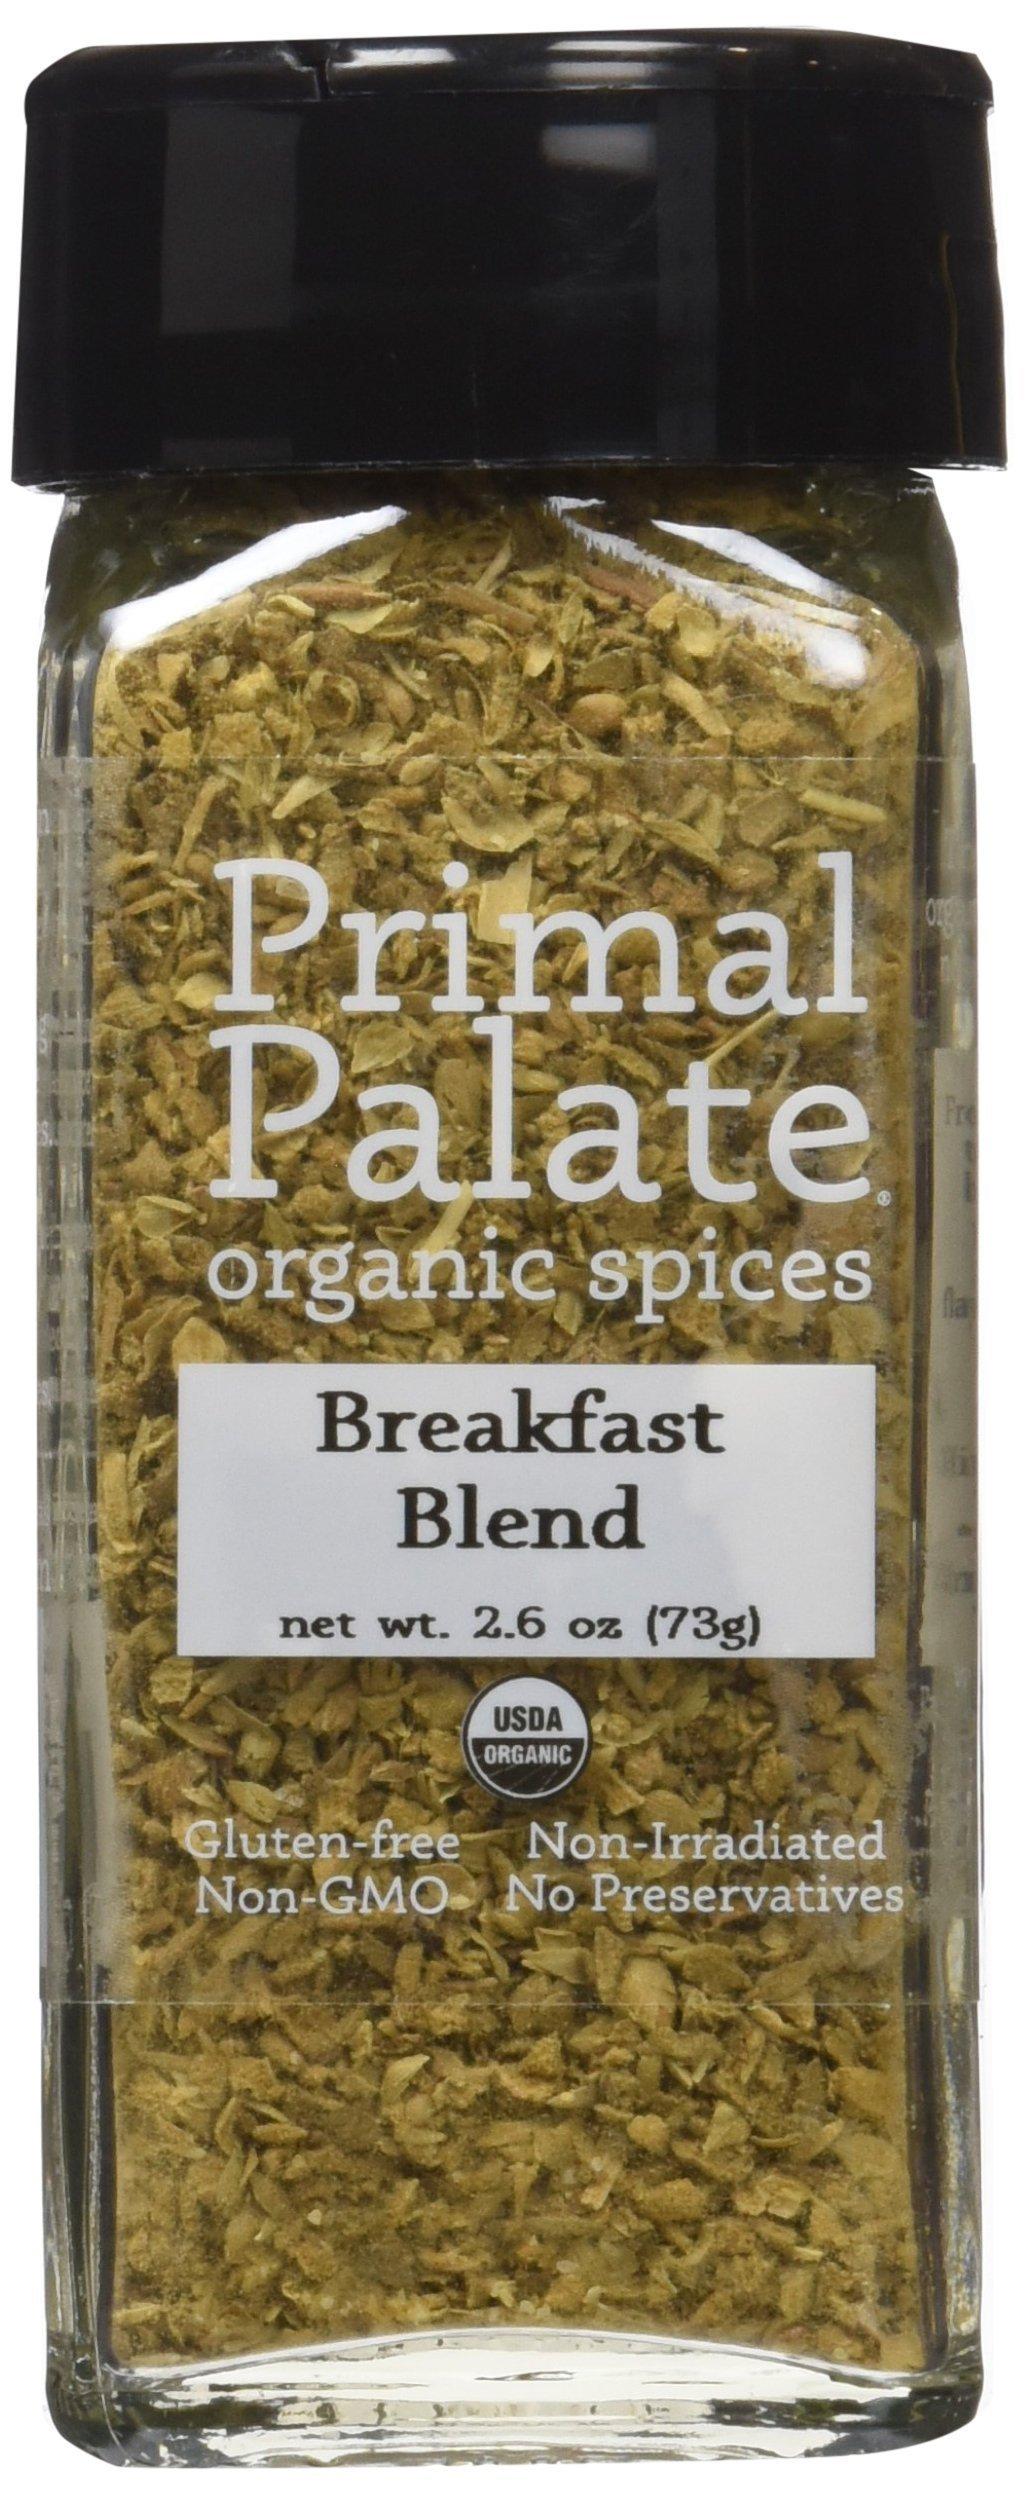 Primal Palate Organic Spices Breakfast Blend, Certified Organic, 2.6 oz Bottle